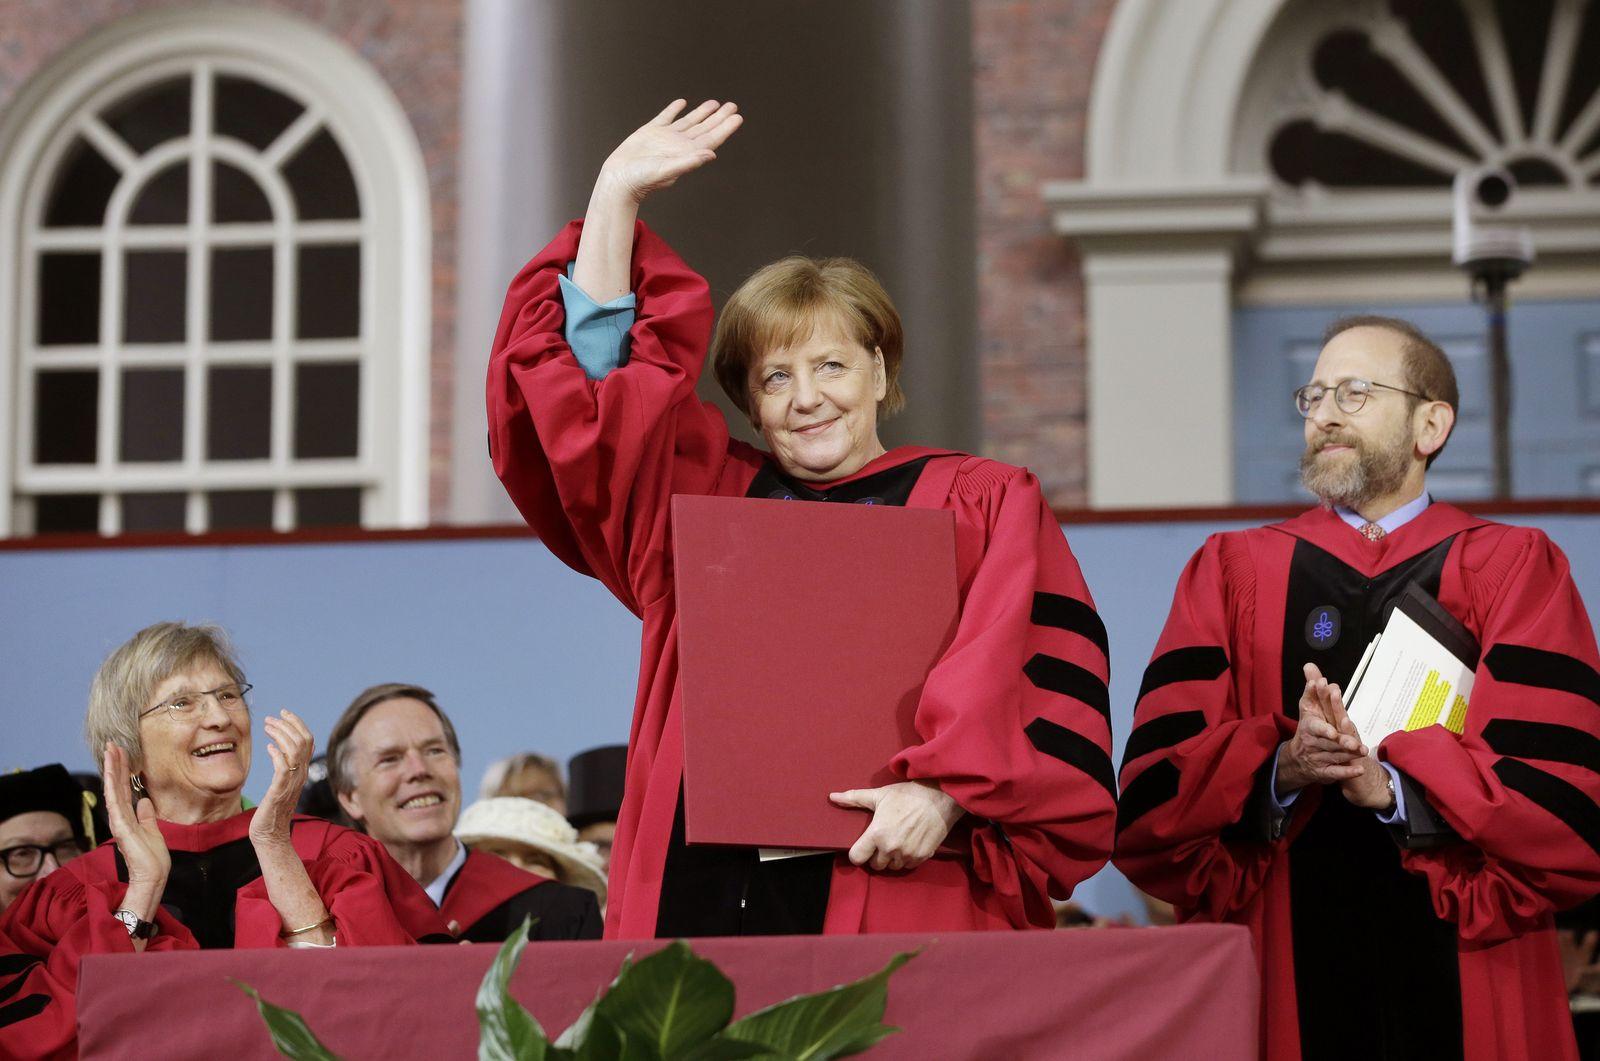 Merkel Ehrengast der Universität Harvard in Cambridge